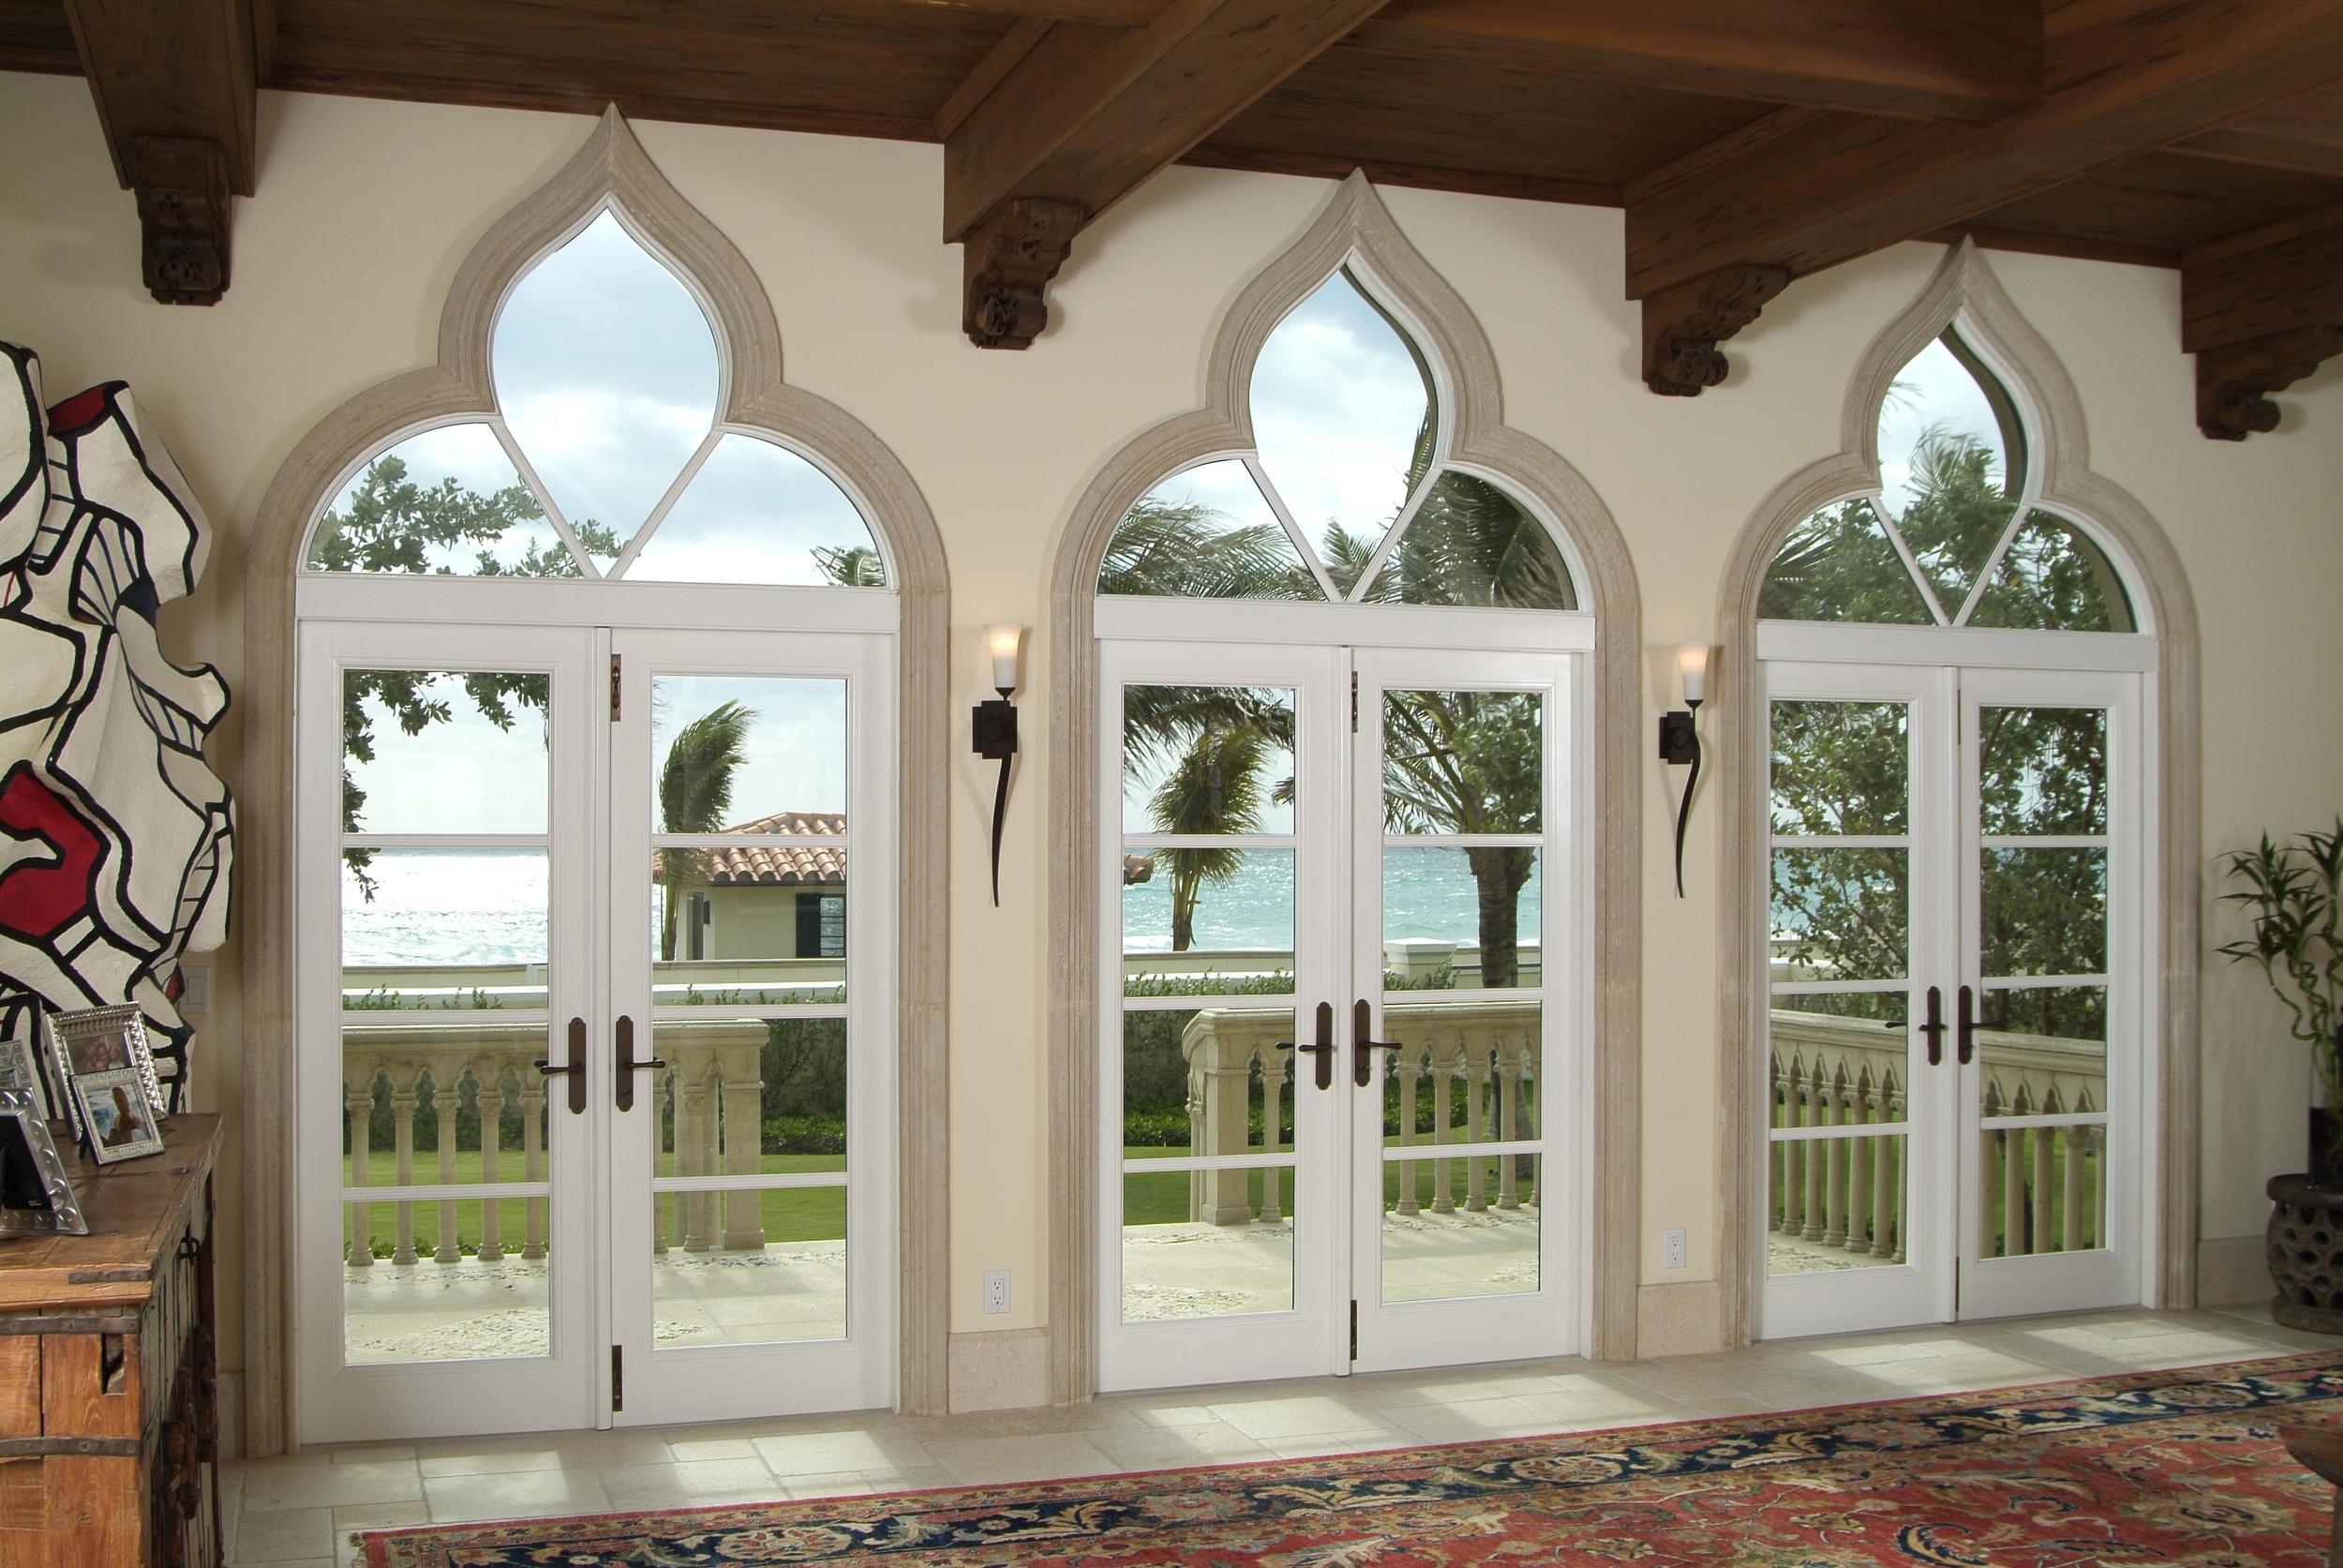 100 Everglade interior.JPG